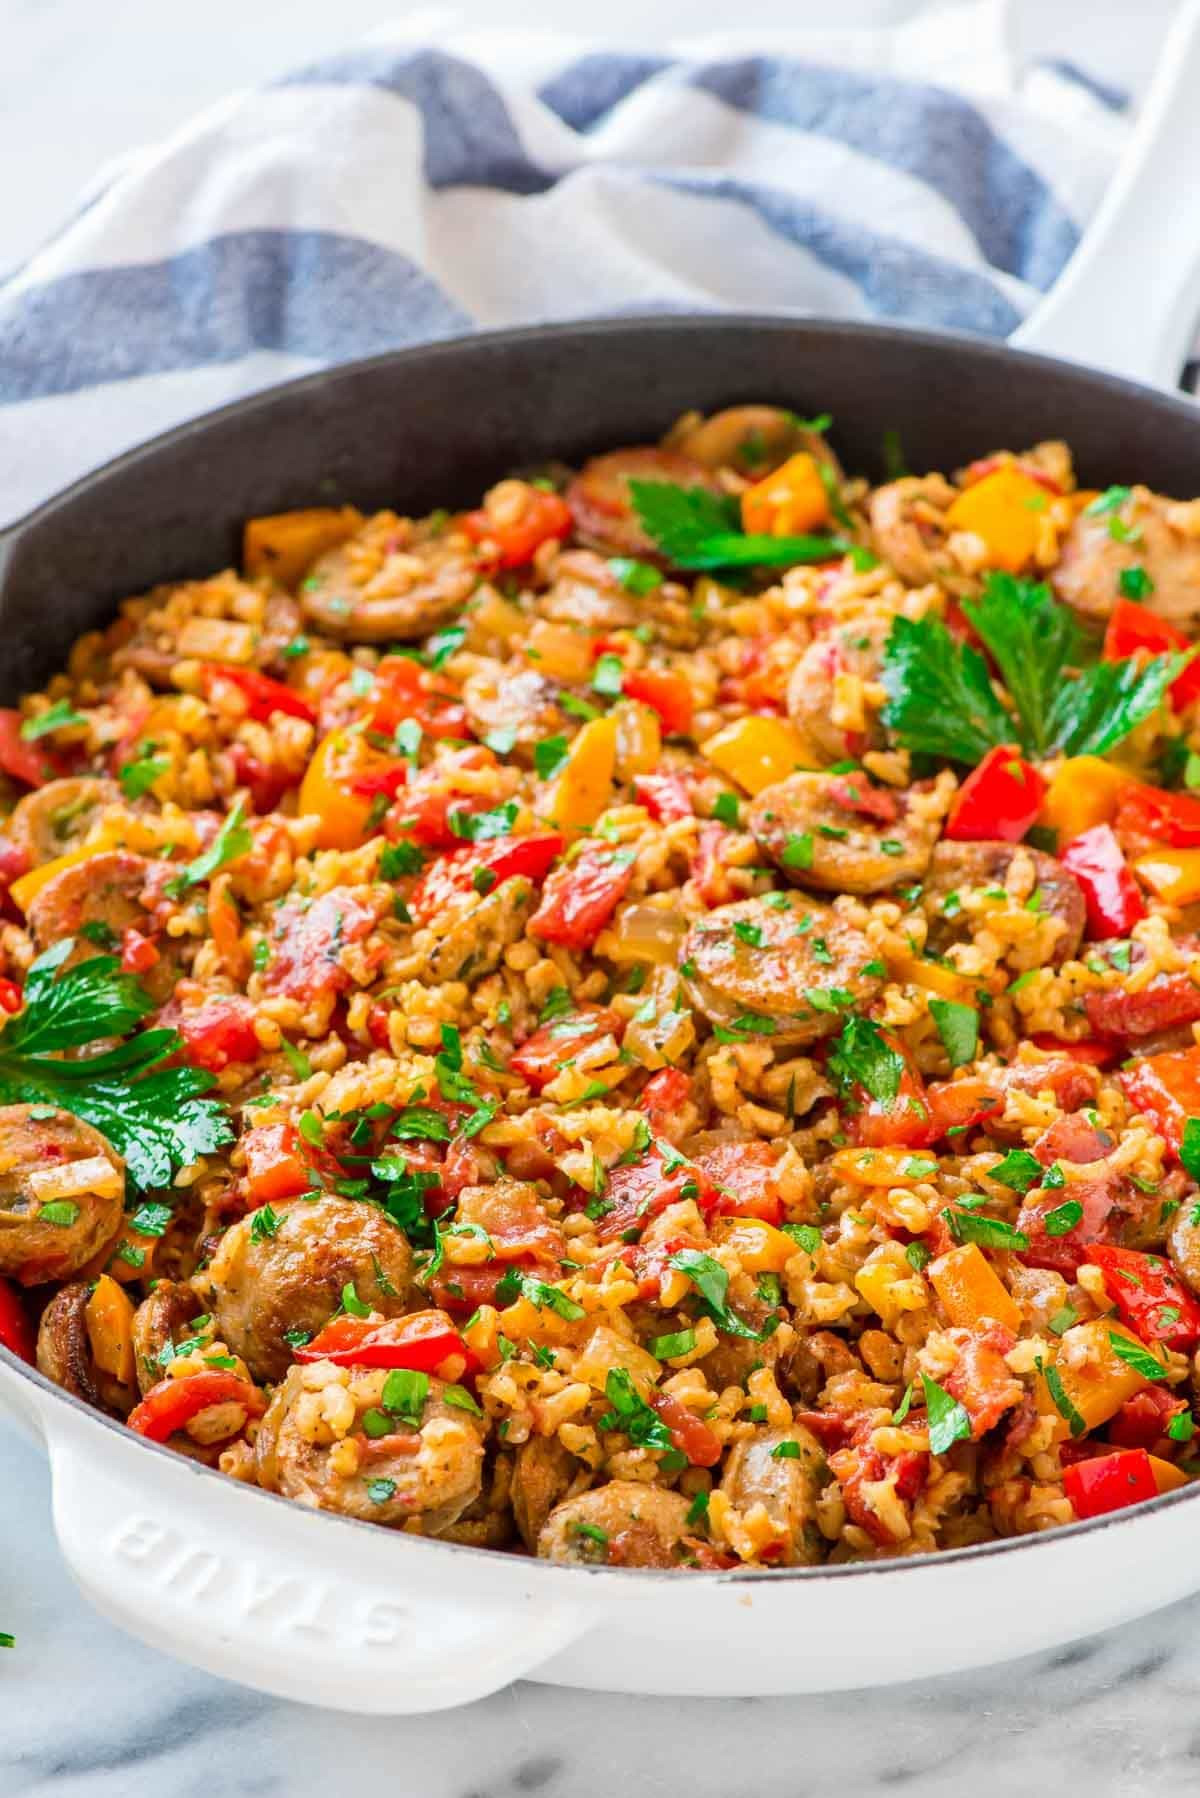 Italian Chicken Sausage Recipes  Italian Sausage and Rice Casserole